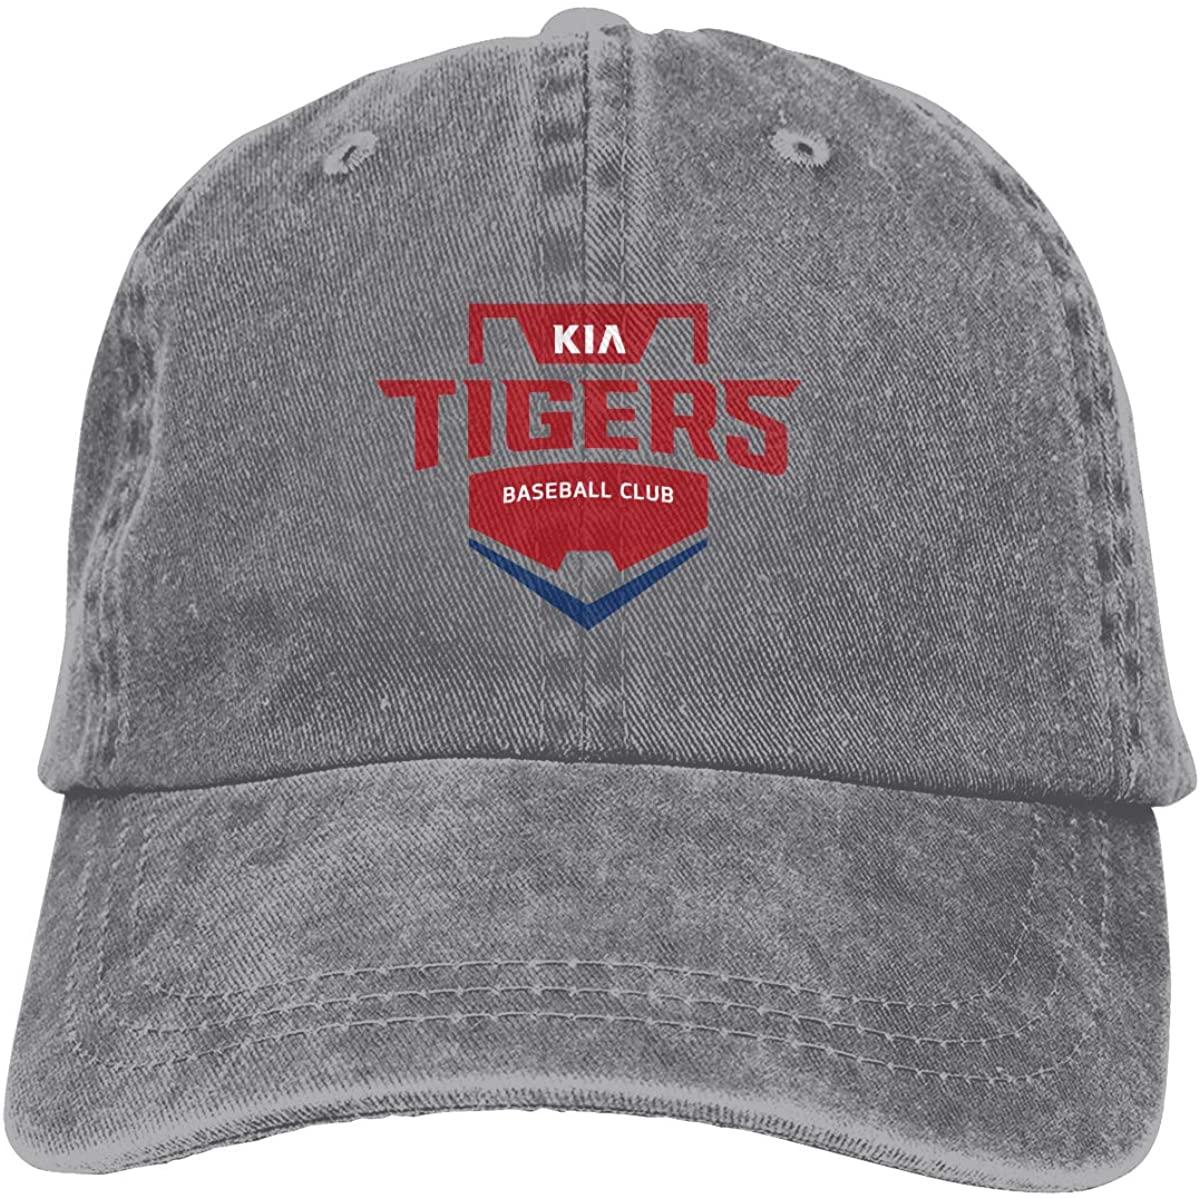 Unisex K-Ia Tigers Cotton & Denim & Tie Dye Dad Hat Baseball Cap